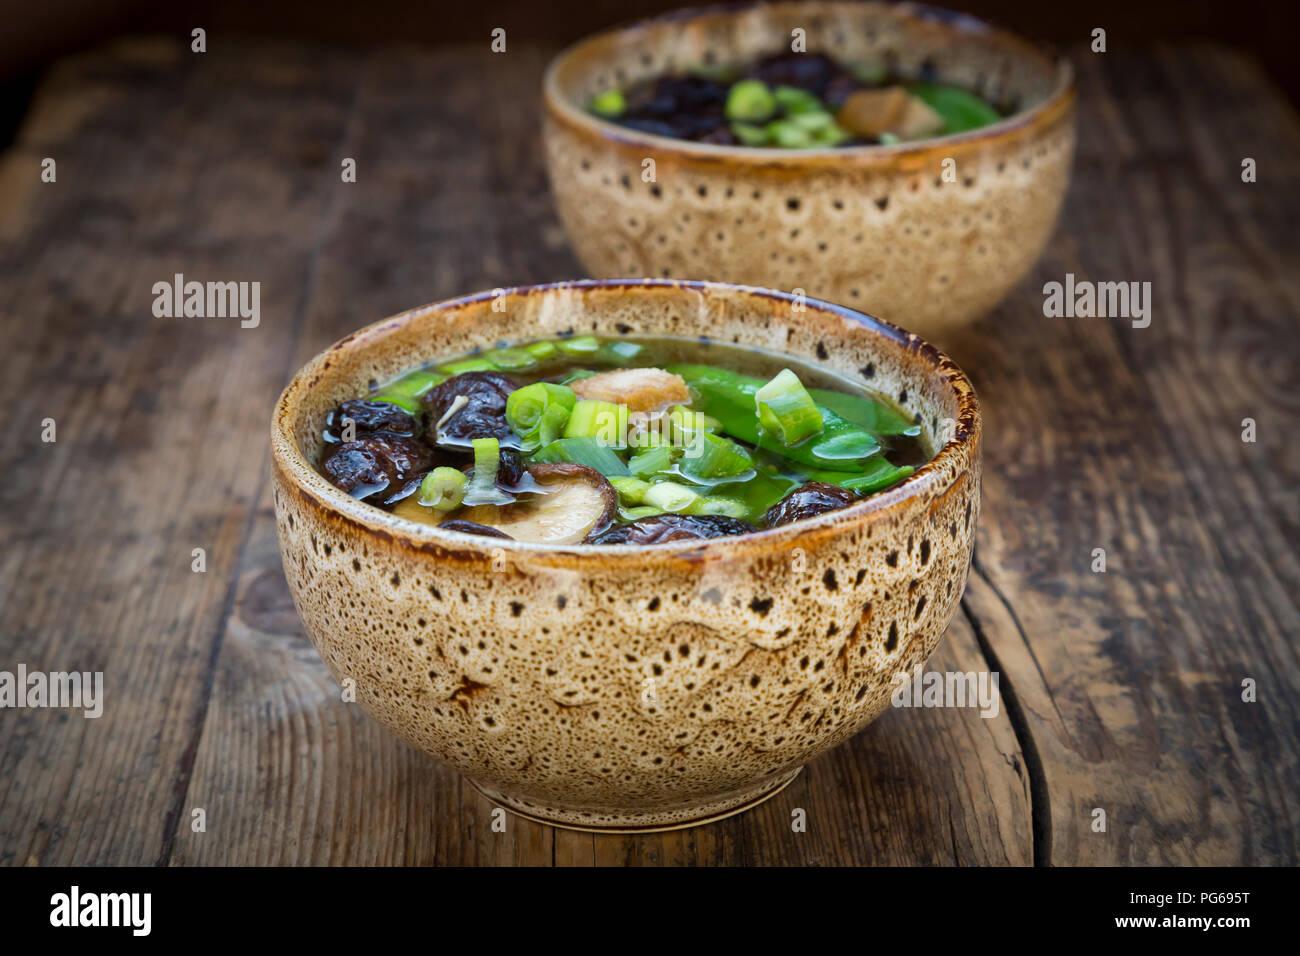 Japanese miso soup with sugar peas, shitake mushrooms, tofu and mung sprouts - Stock Image